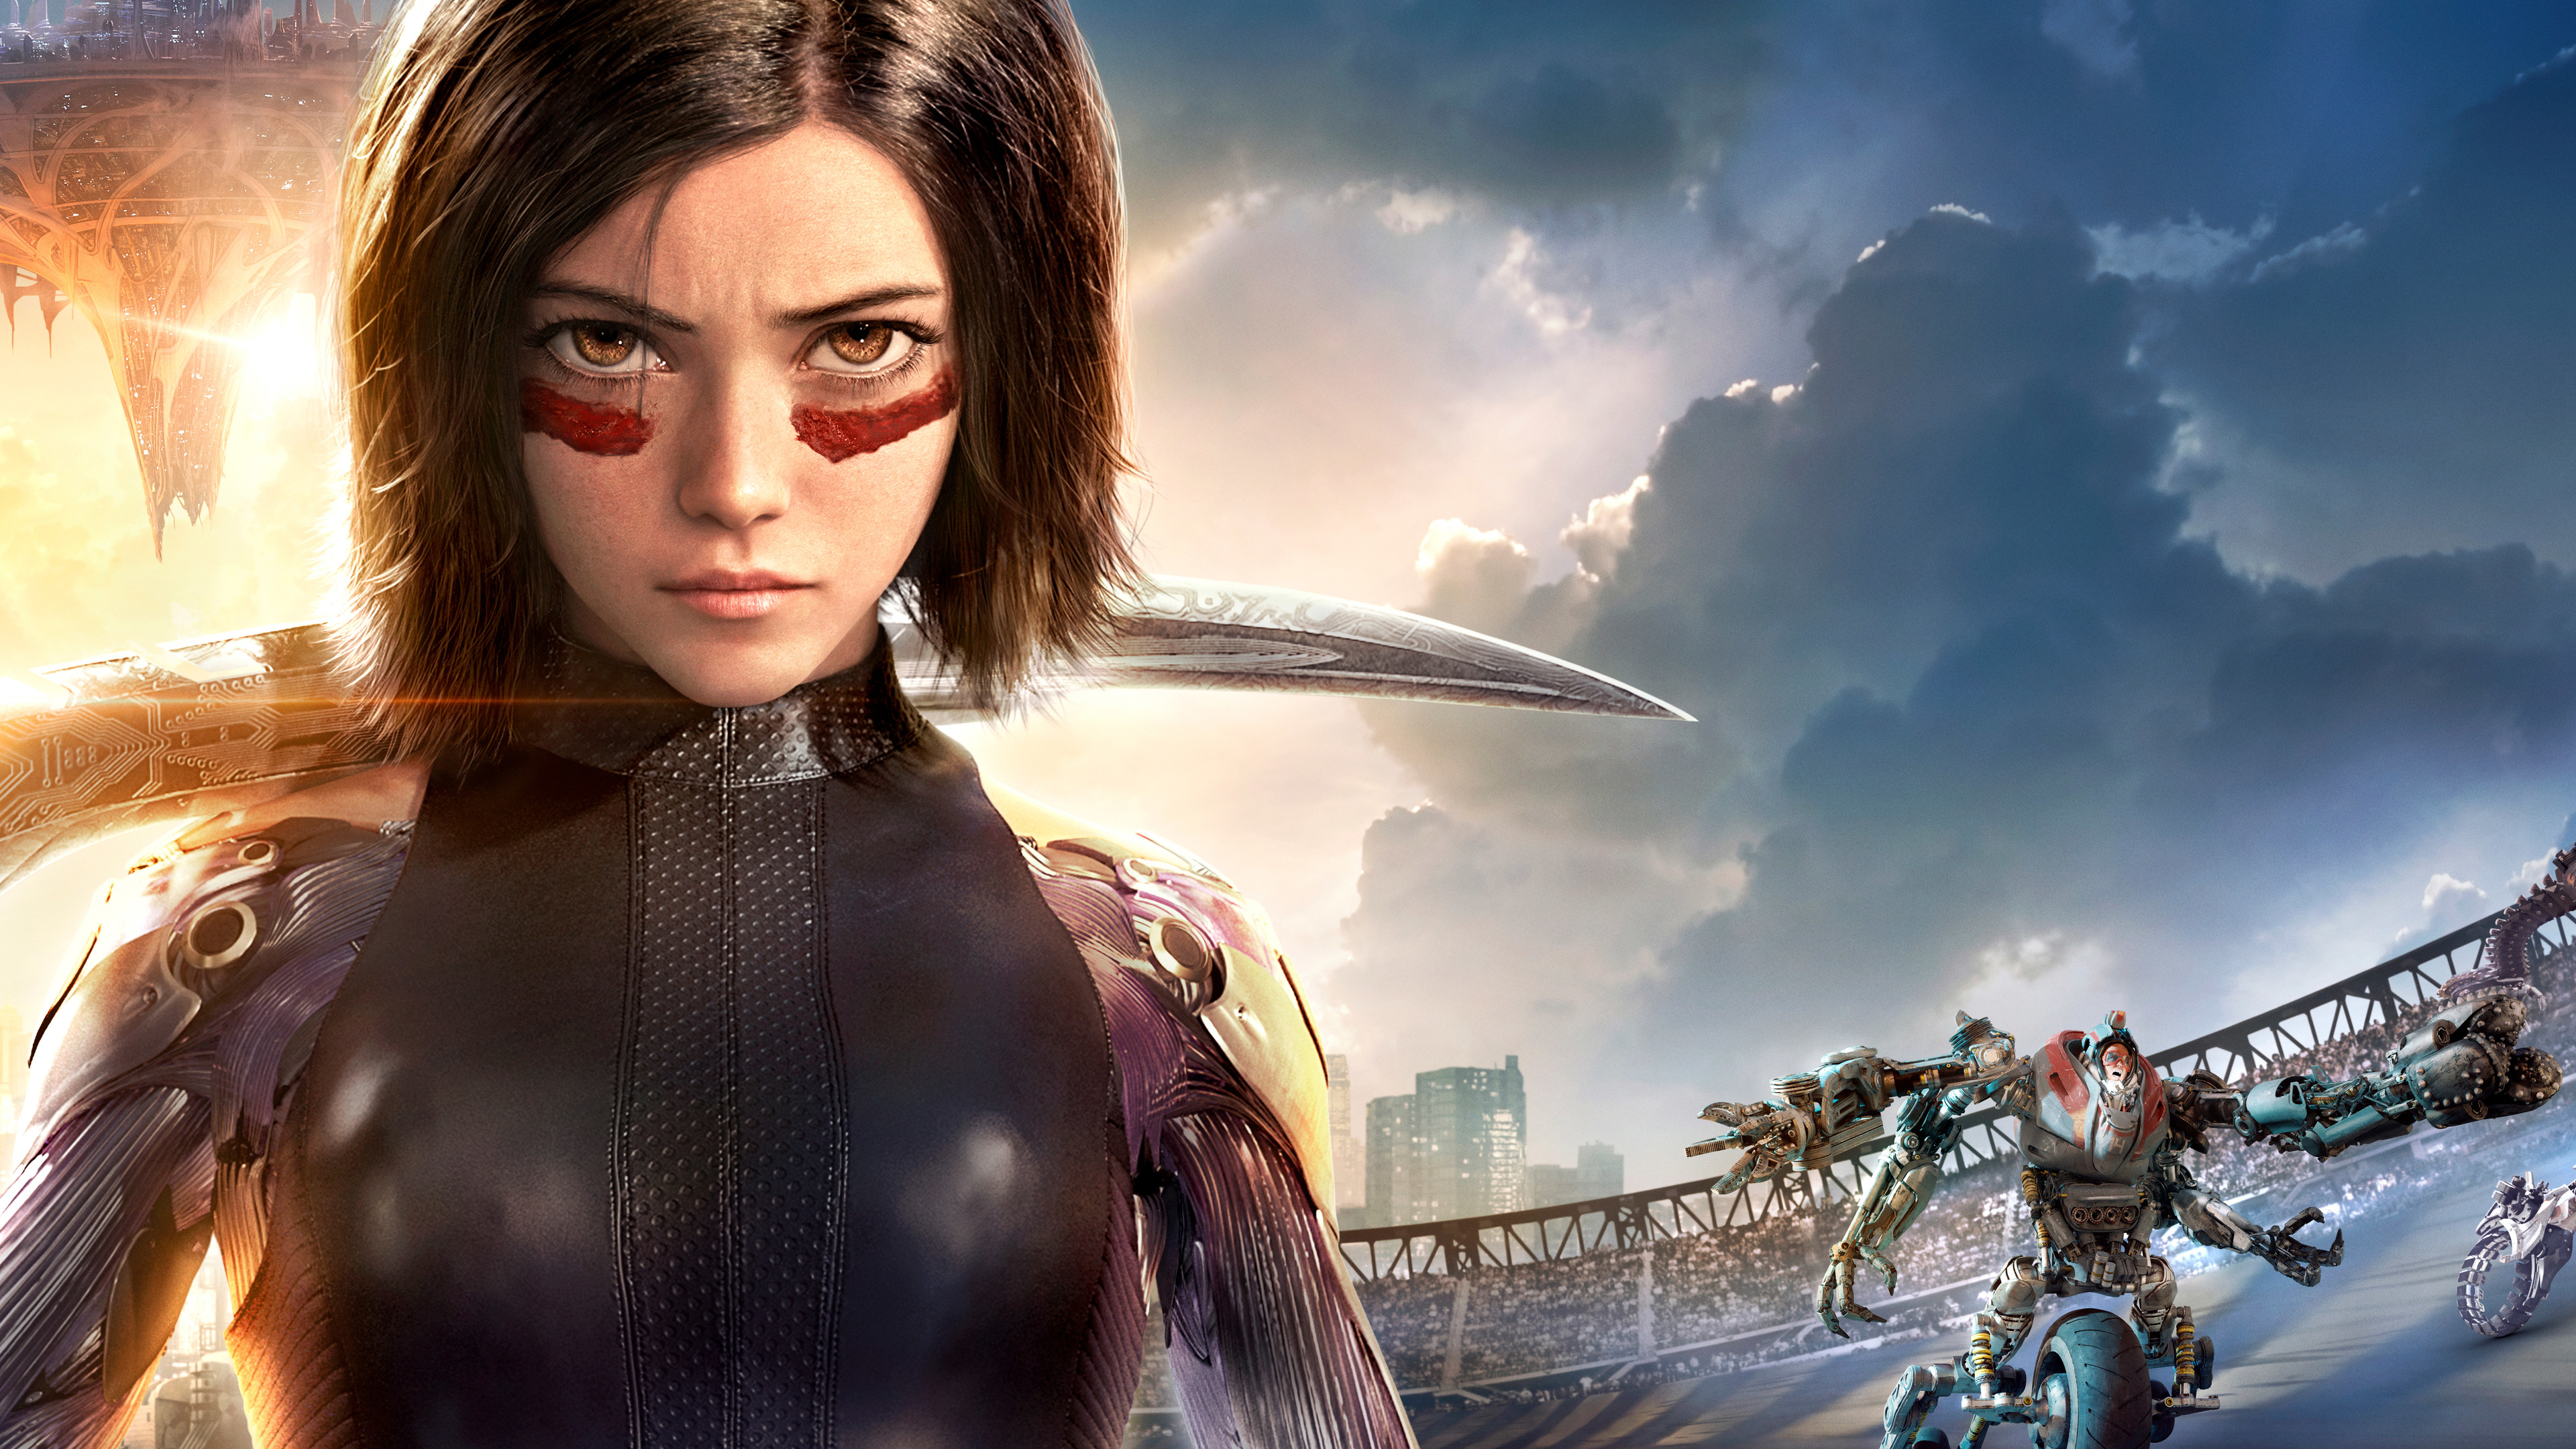 Wallpaper 4k Alita Battle Angel 4k 2019 Movies Wallpapers 4k